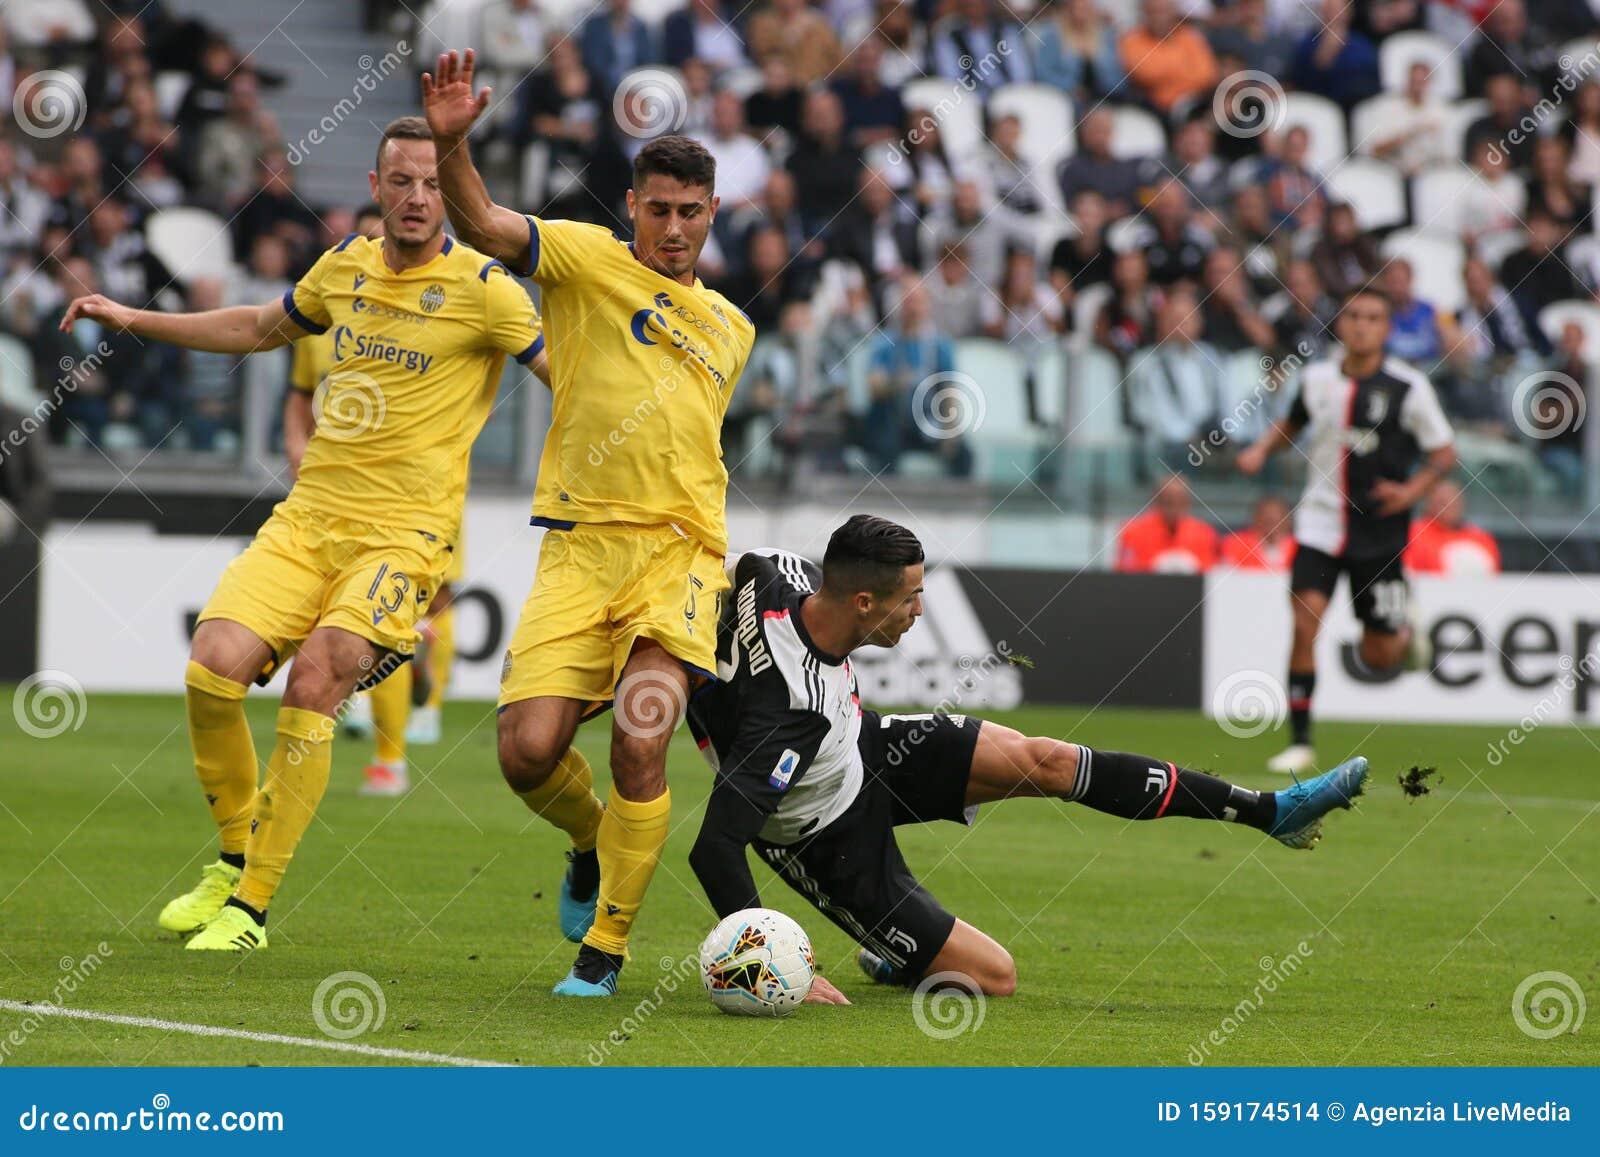 Juventus news: 'People are stupid' - Ronaldo dismisses ...  |Juventus Verona